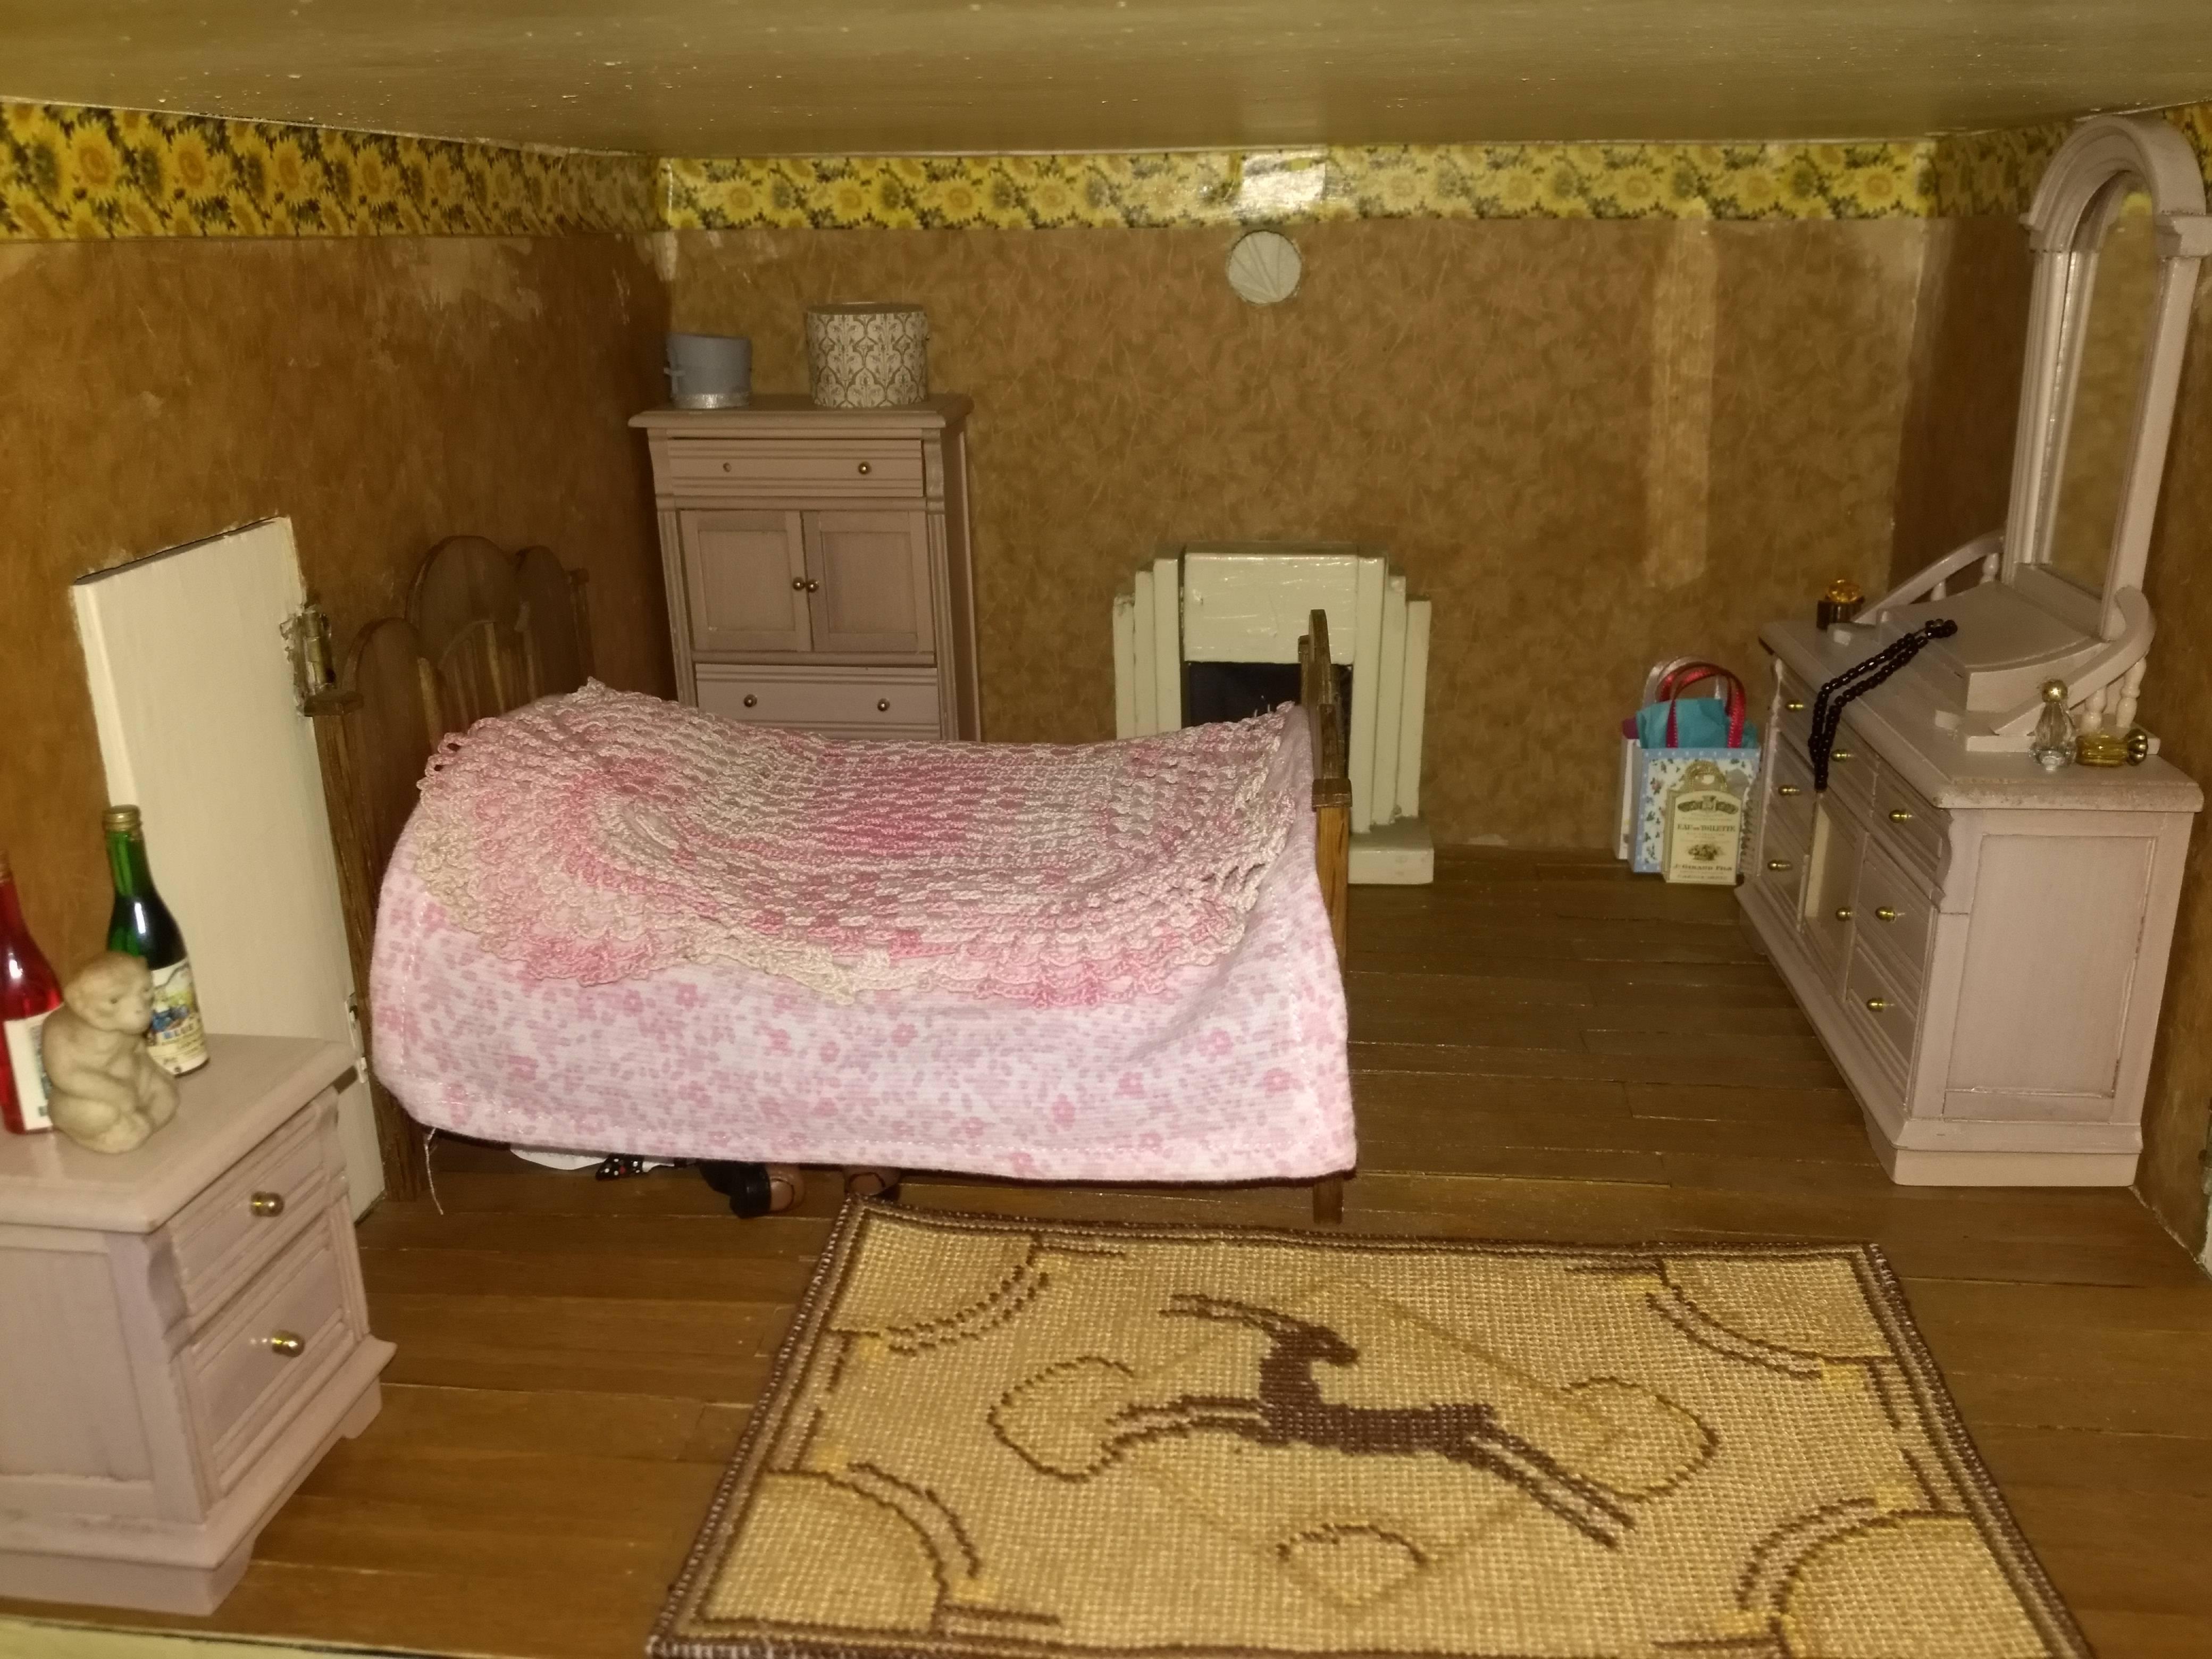 Victoria and Williams bedroom